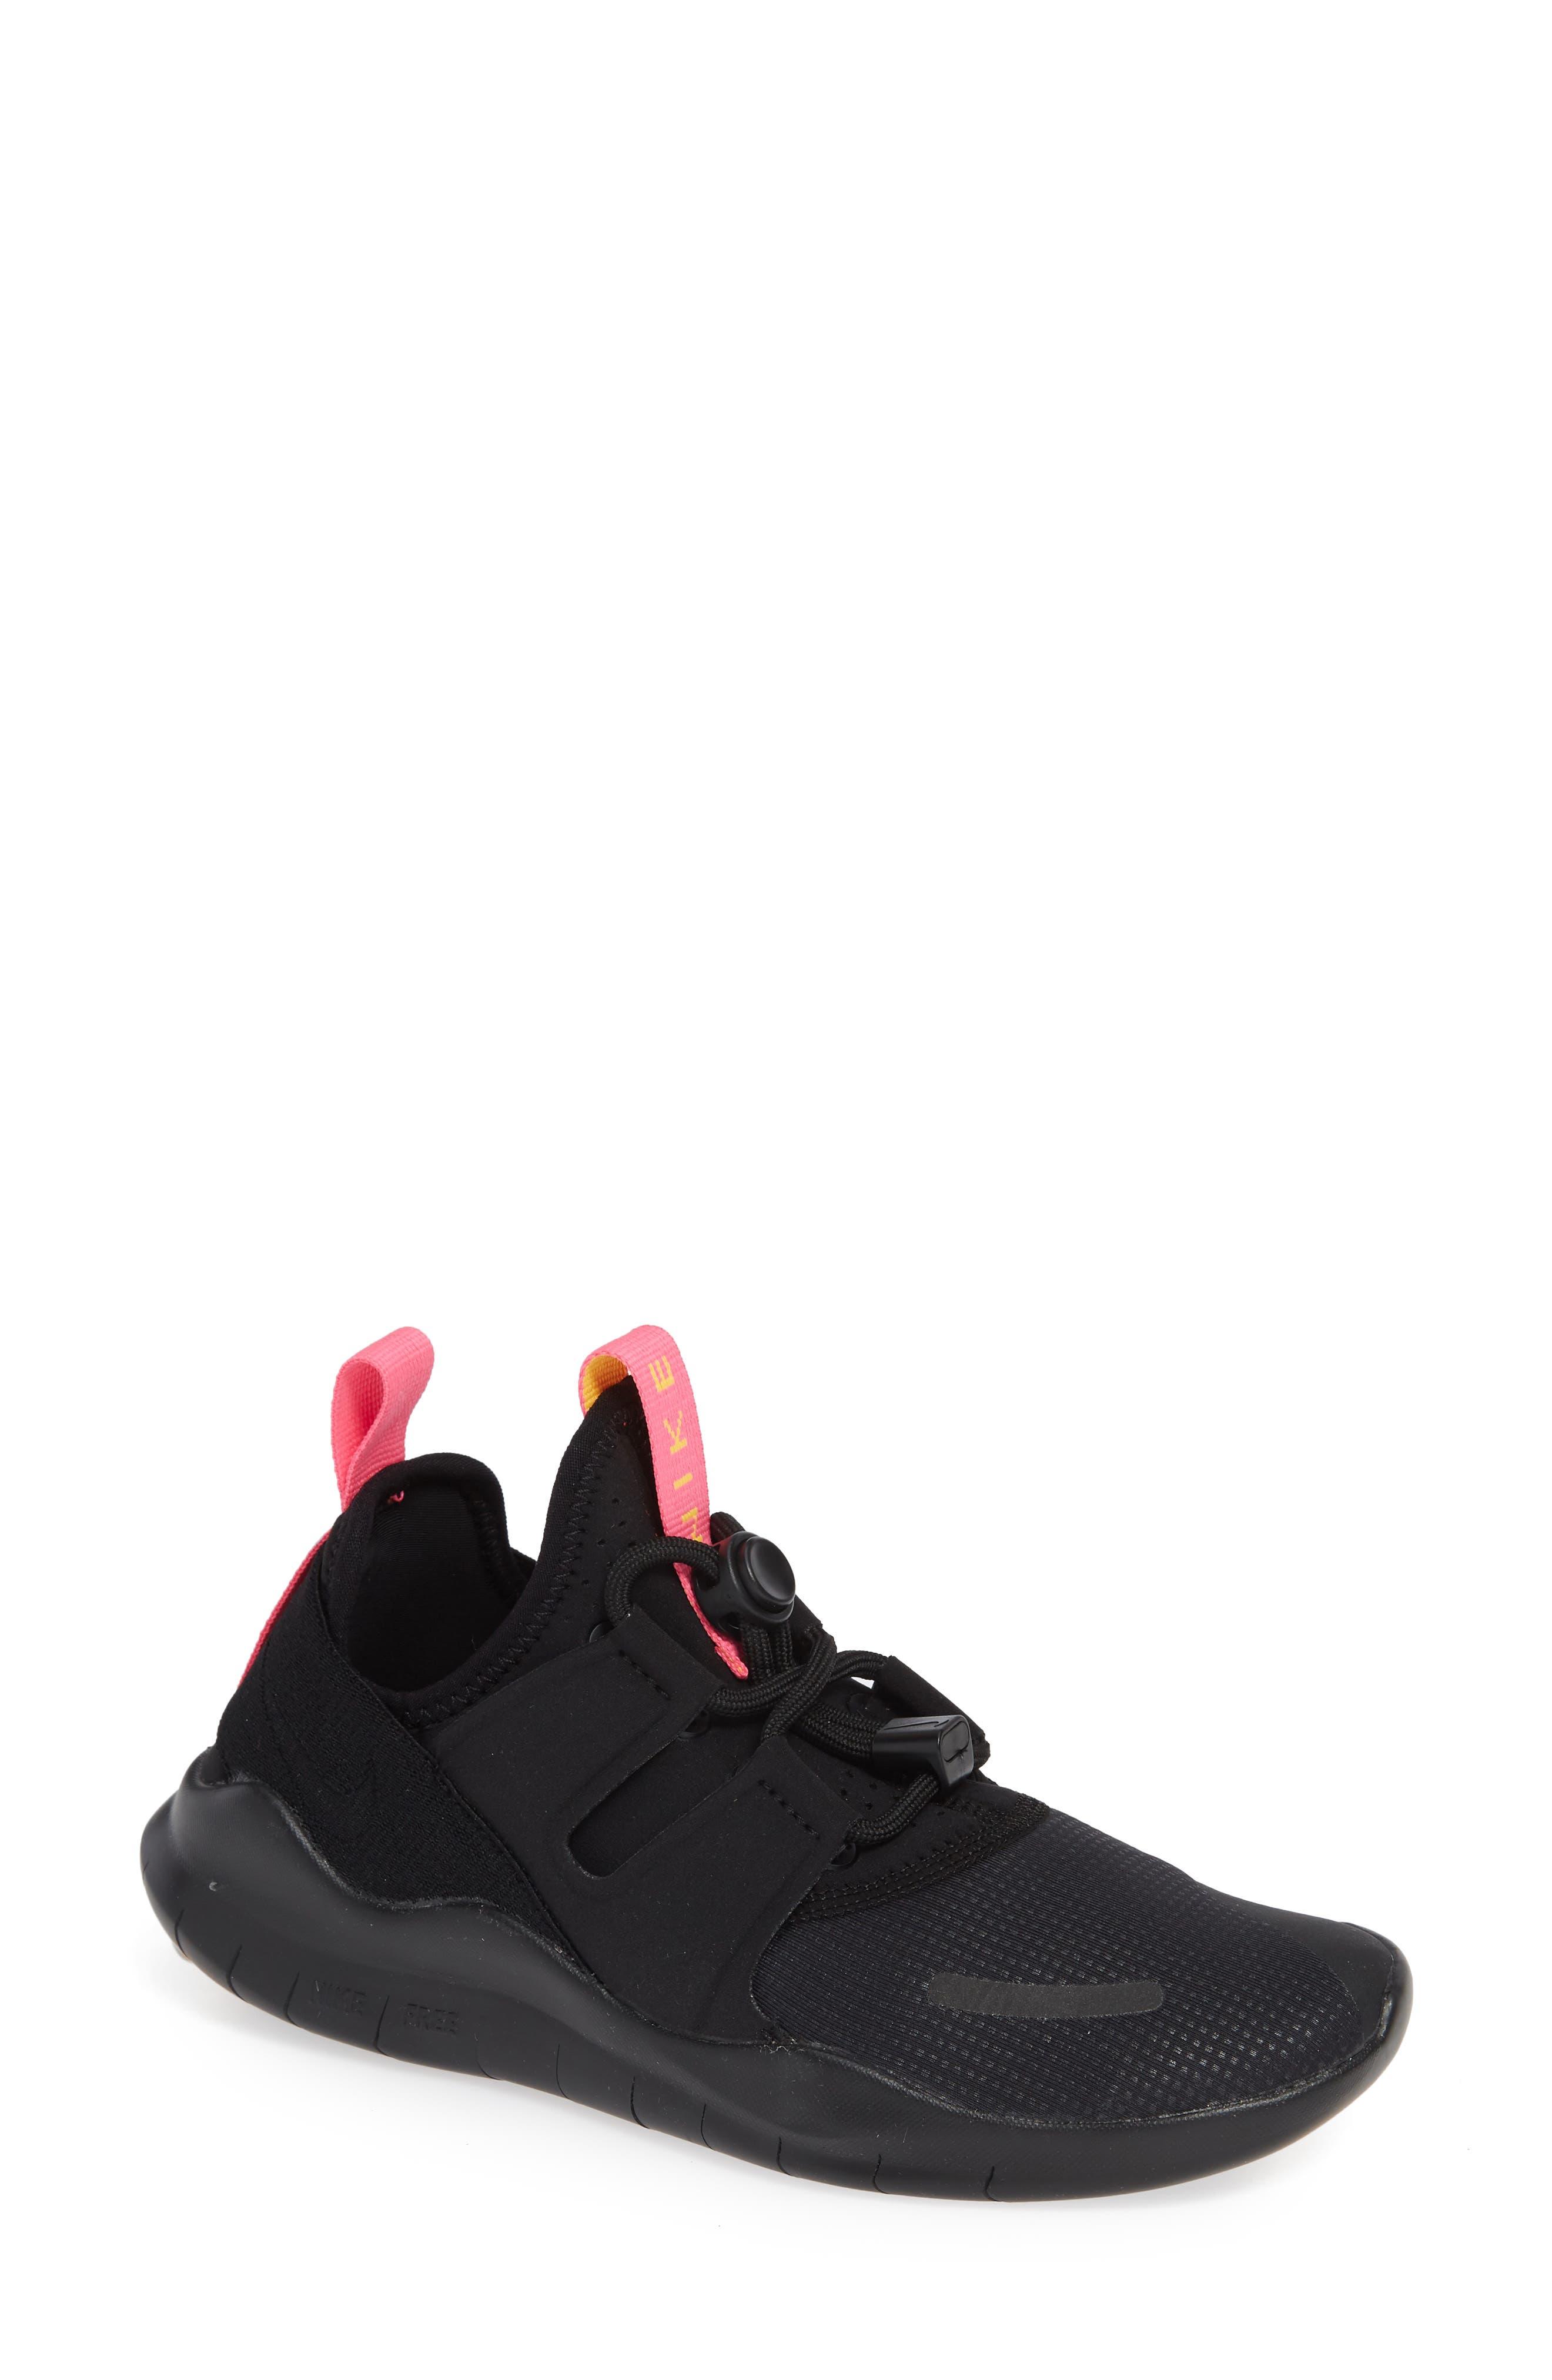 Free RN Commuter 2018 Running Shoe,                             Main thumbnail 1, color,                             BLACK/ PINK BLAST/ ORANGE